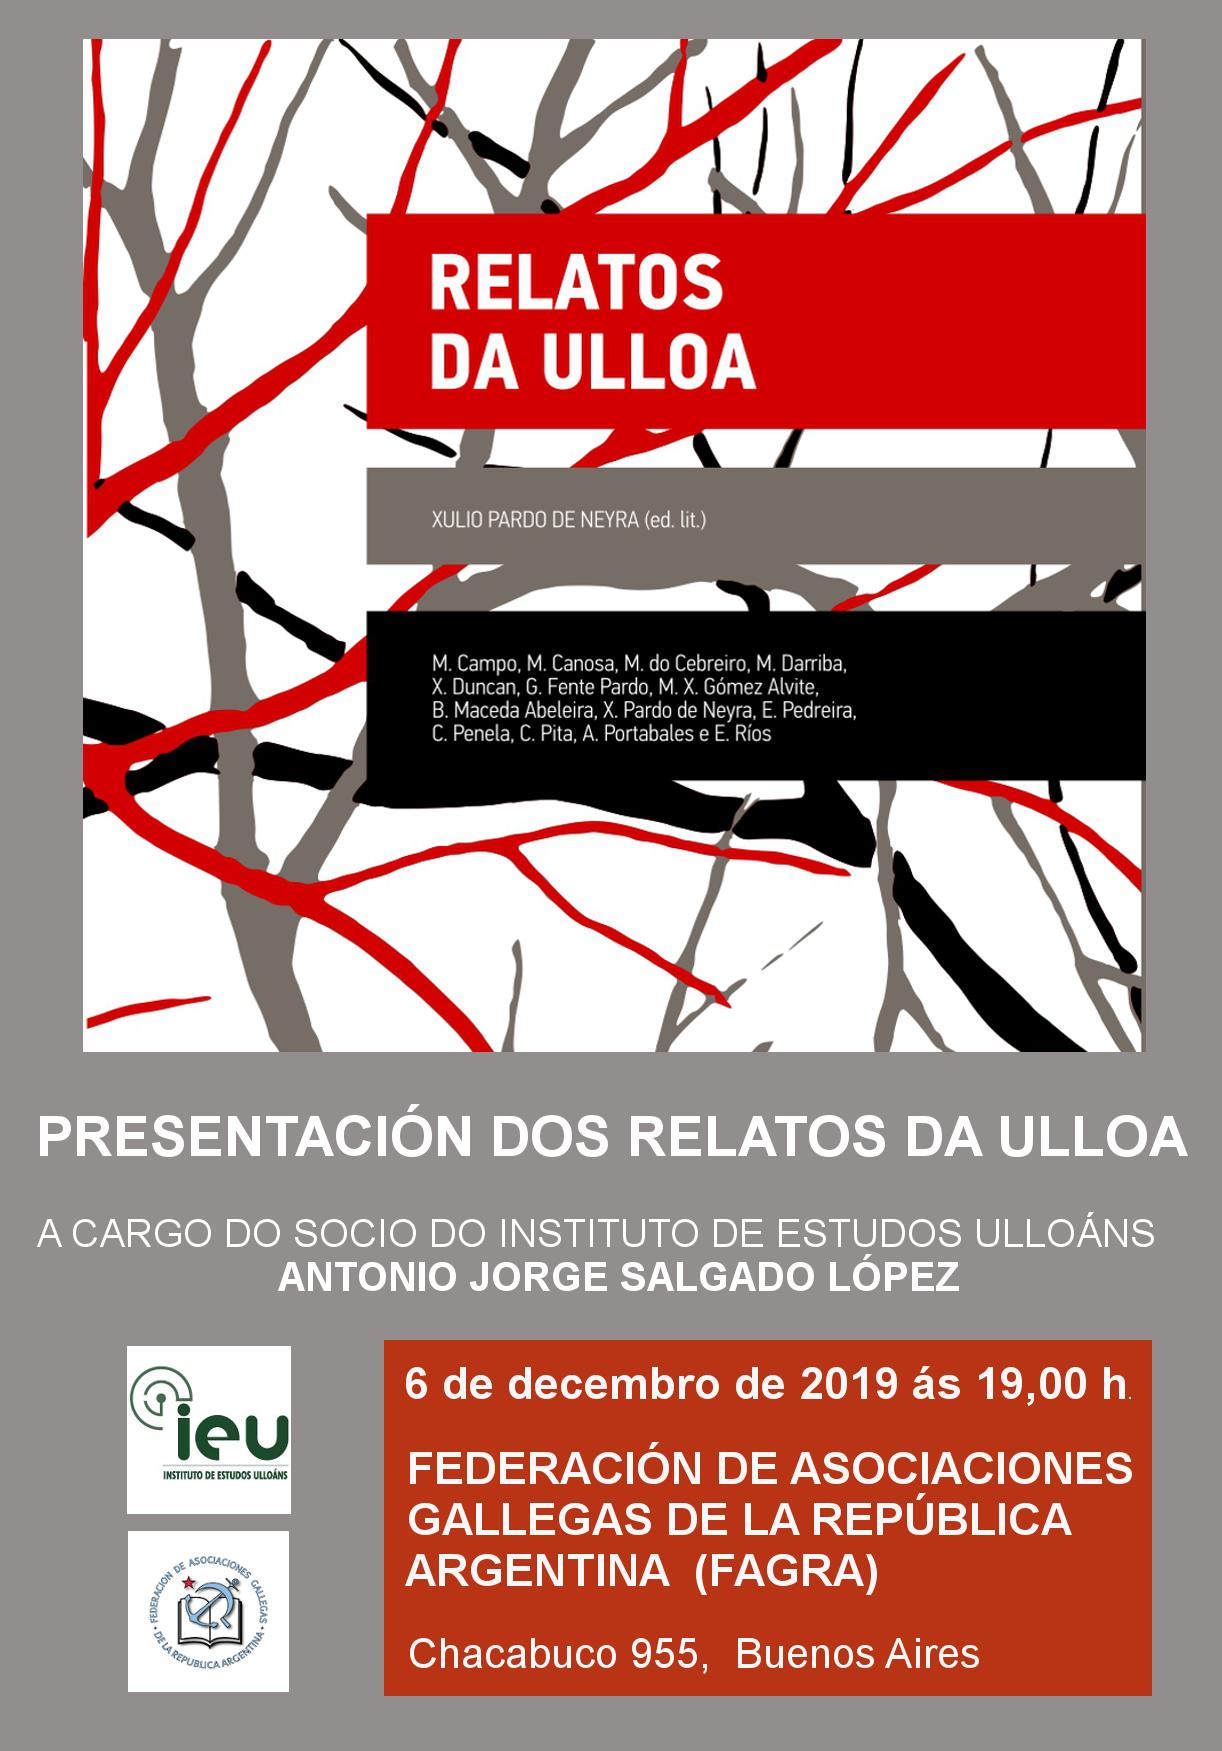 http://ieu.gal/wp-content/uploads/2019/11/Presentaci%C3%B3n-Relatos-Ulloa-en-Buenos-Aires-IEU-Instituto-de-Estudos-Ullo%C3%A1ns.jpg